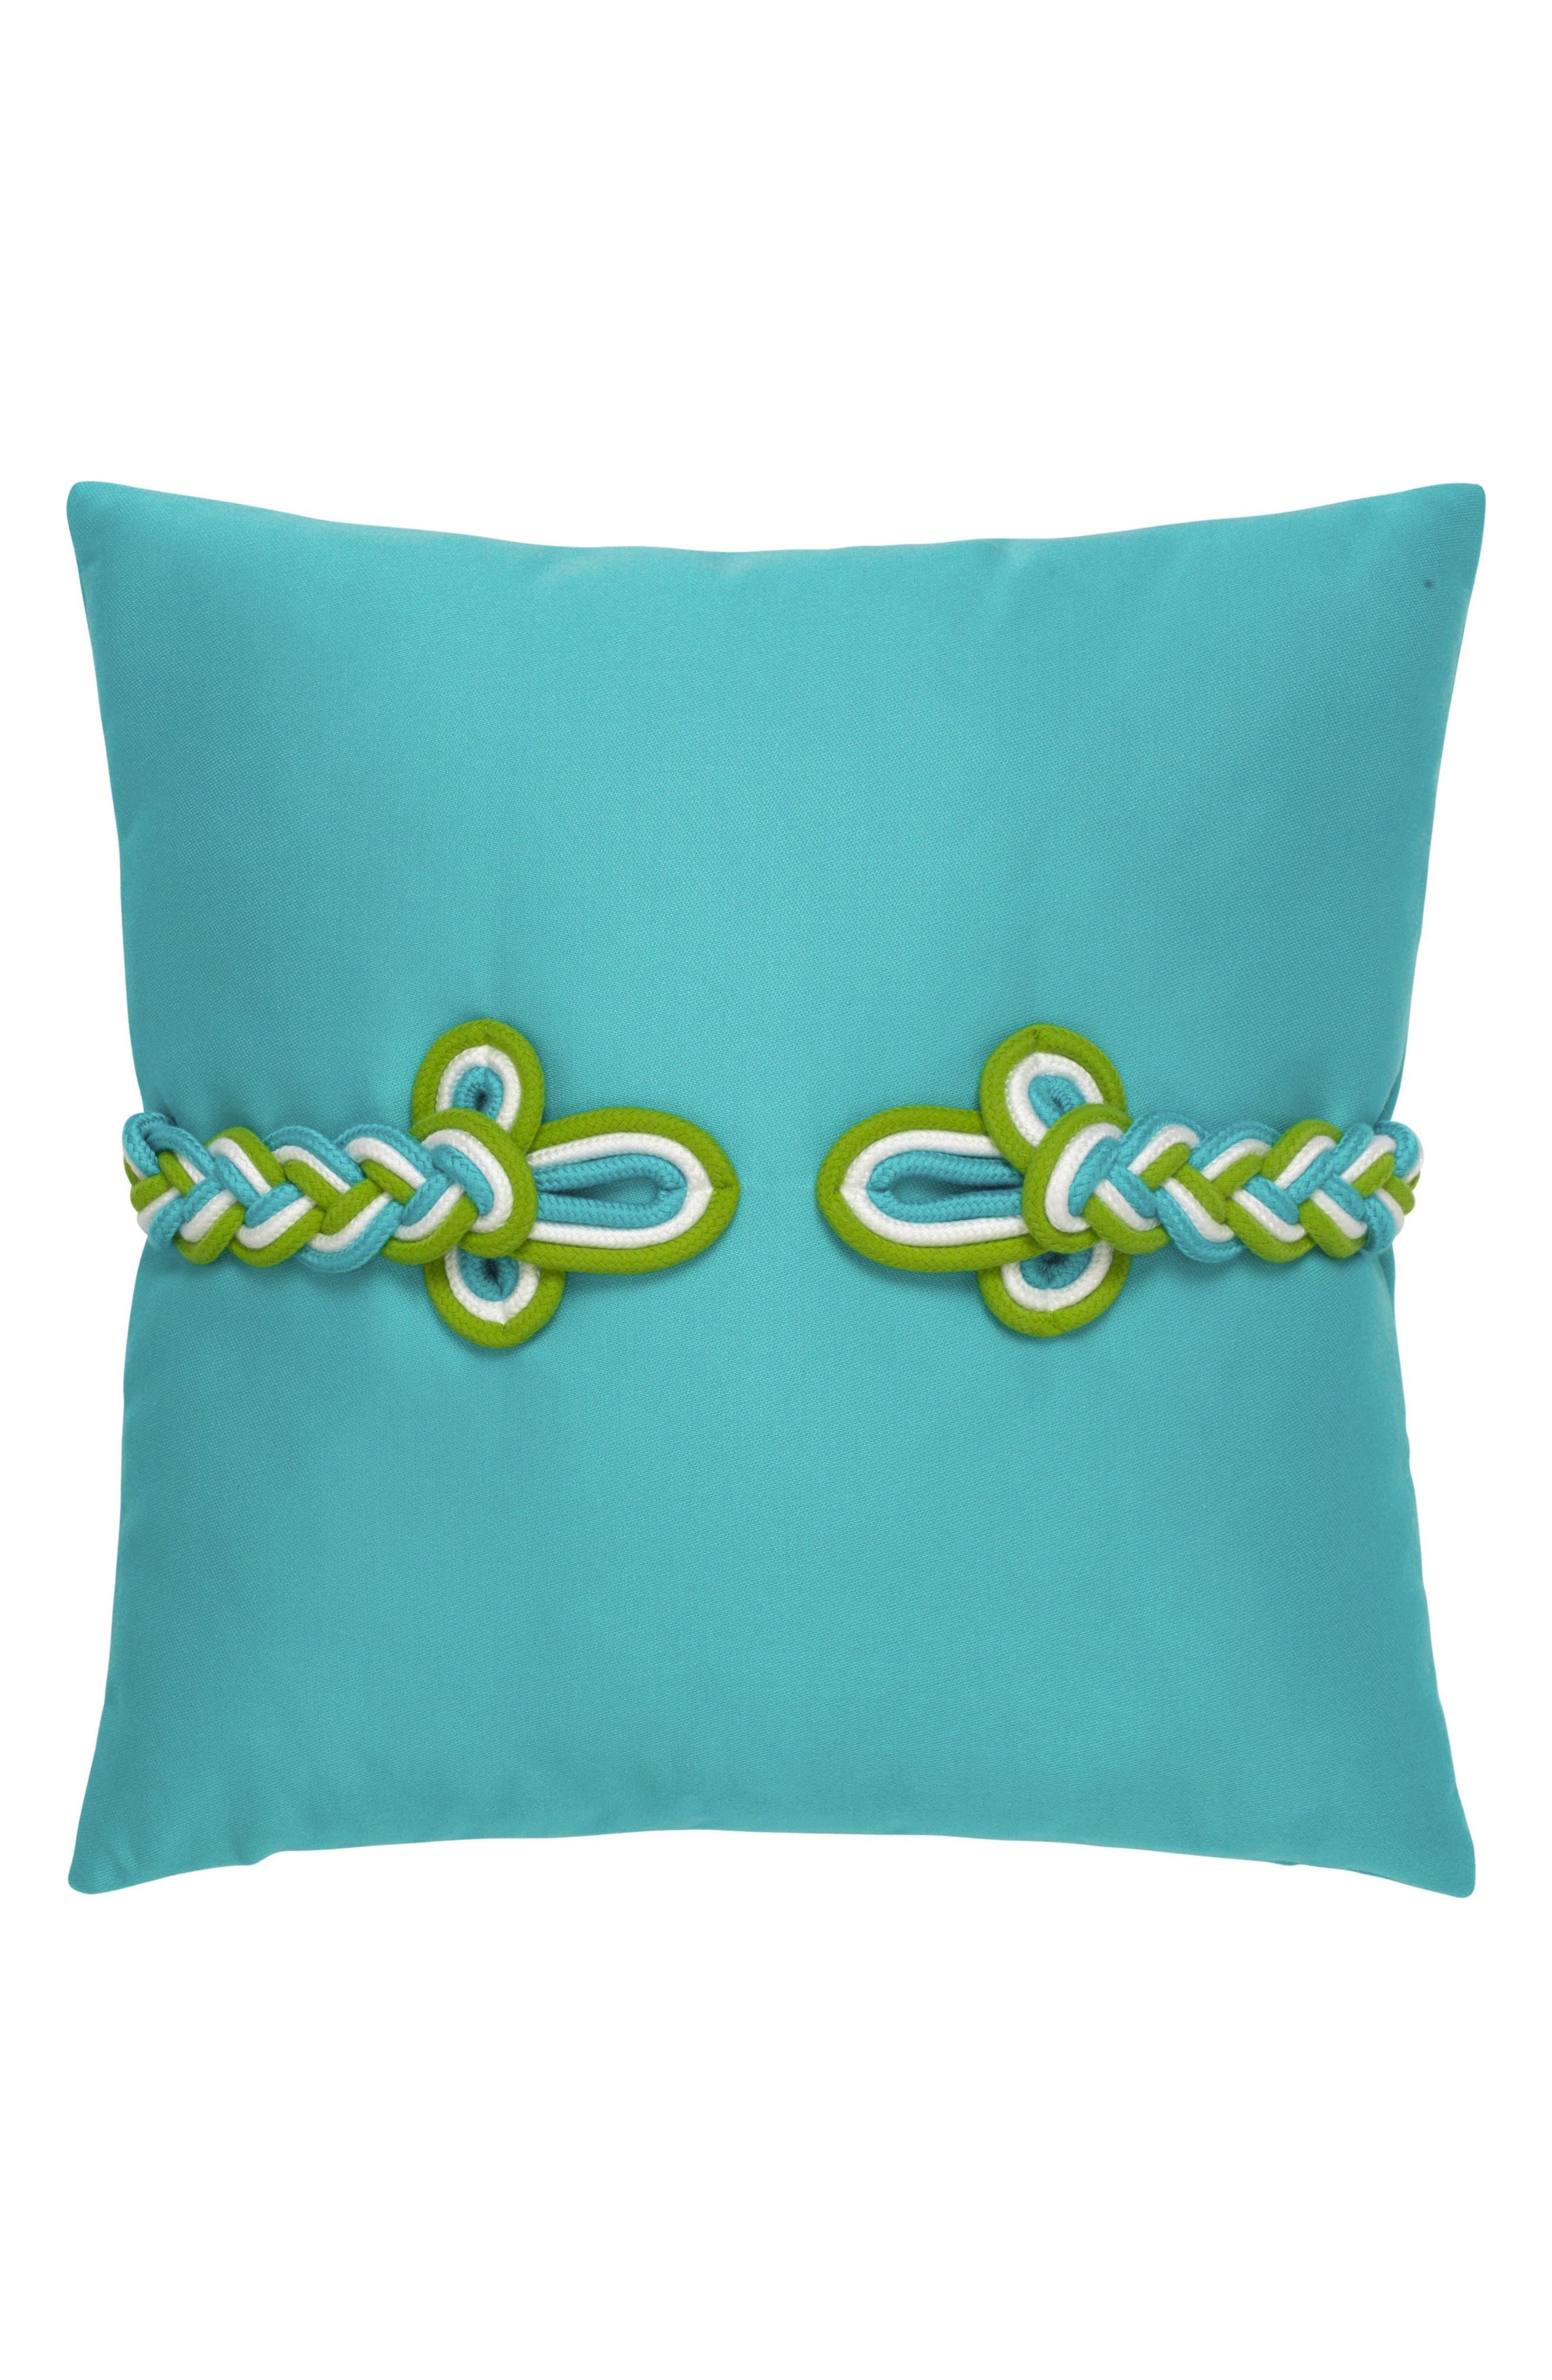 Main Image - Elaine Smith Aruba Frogs Clasp Indoor/Outdoor Accent Pillow